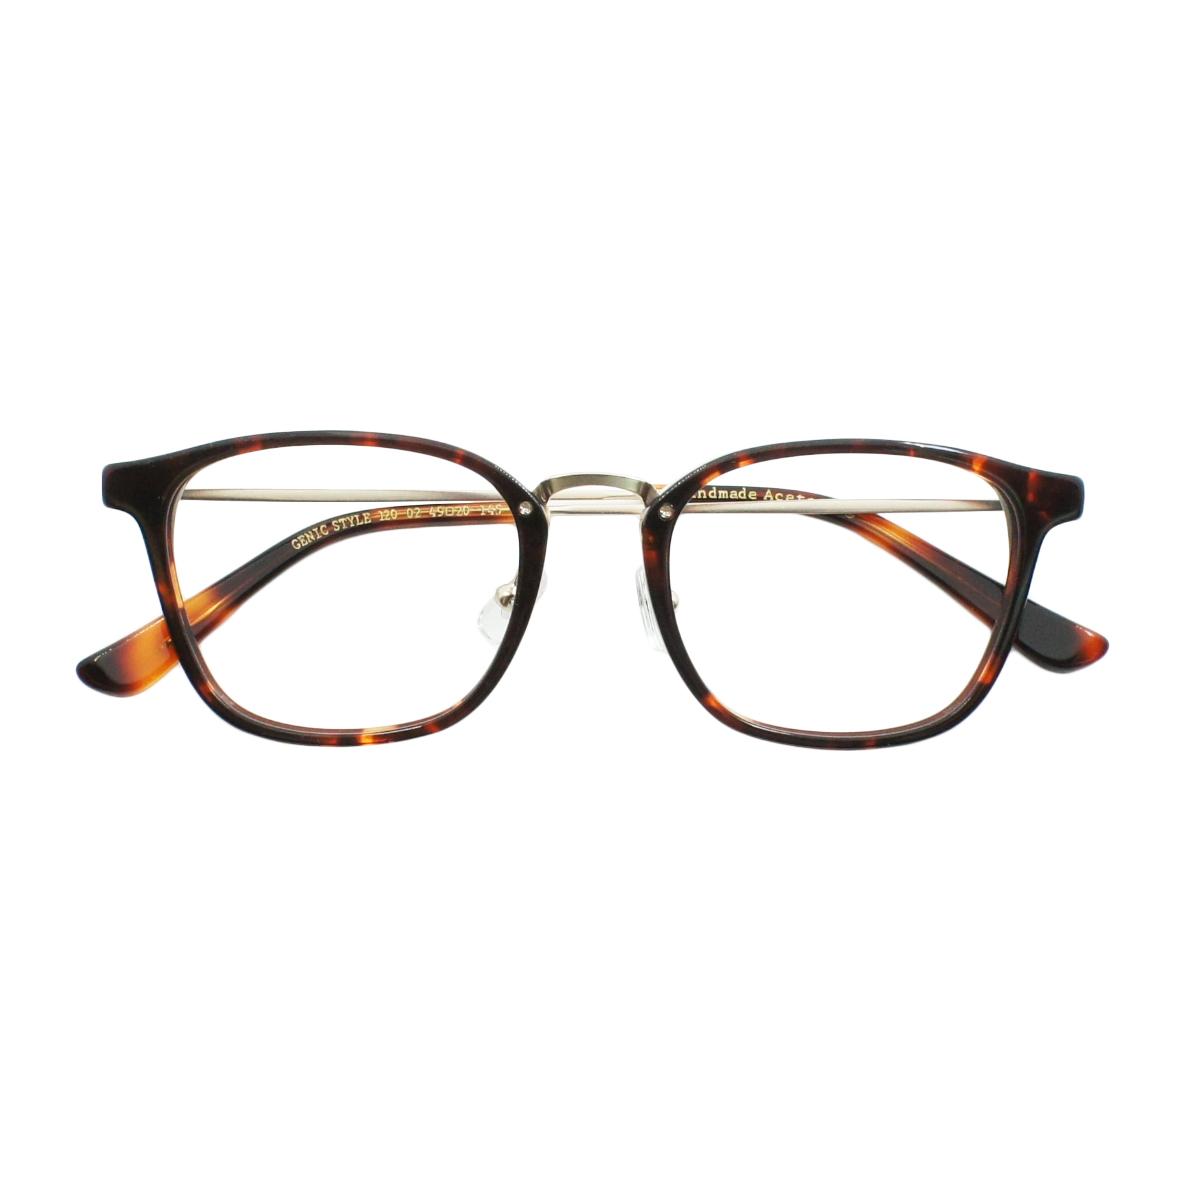 Genic Eyewear Style 120 Col.02